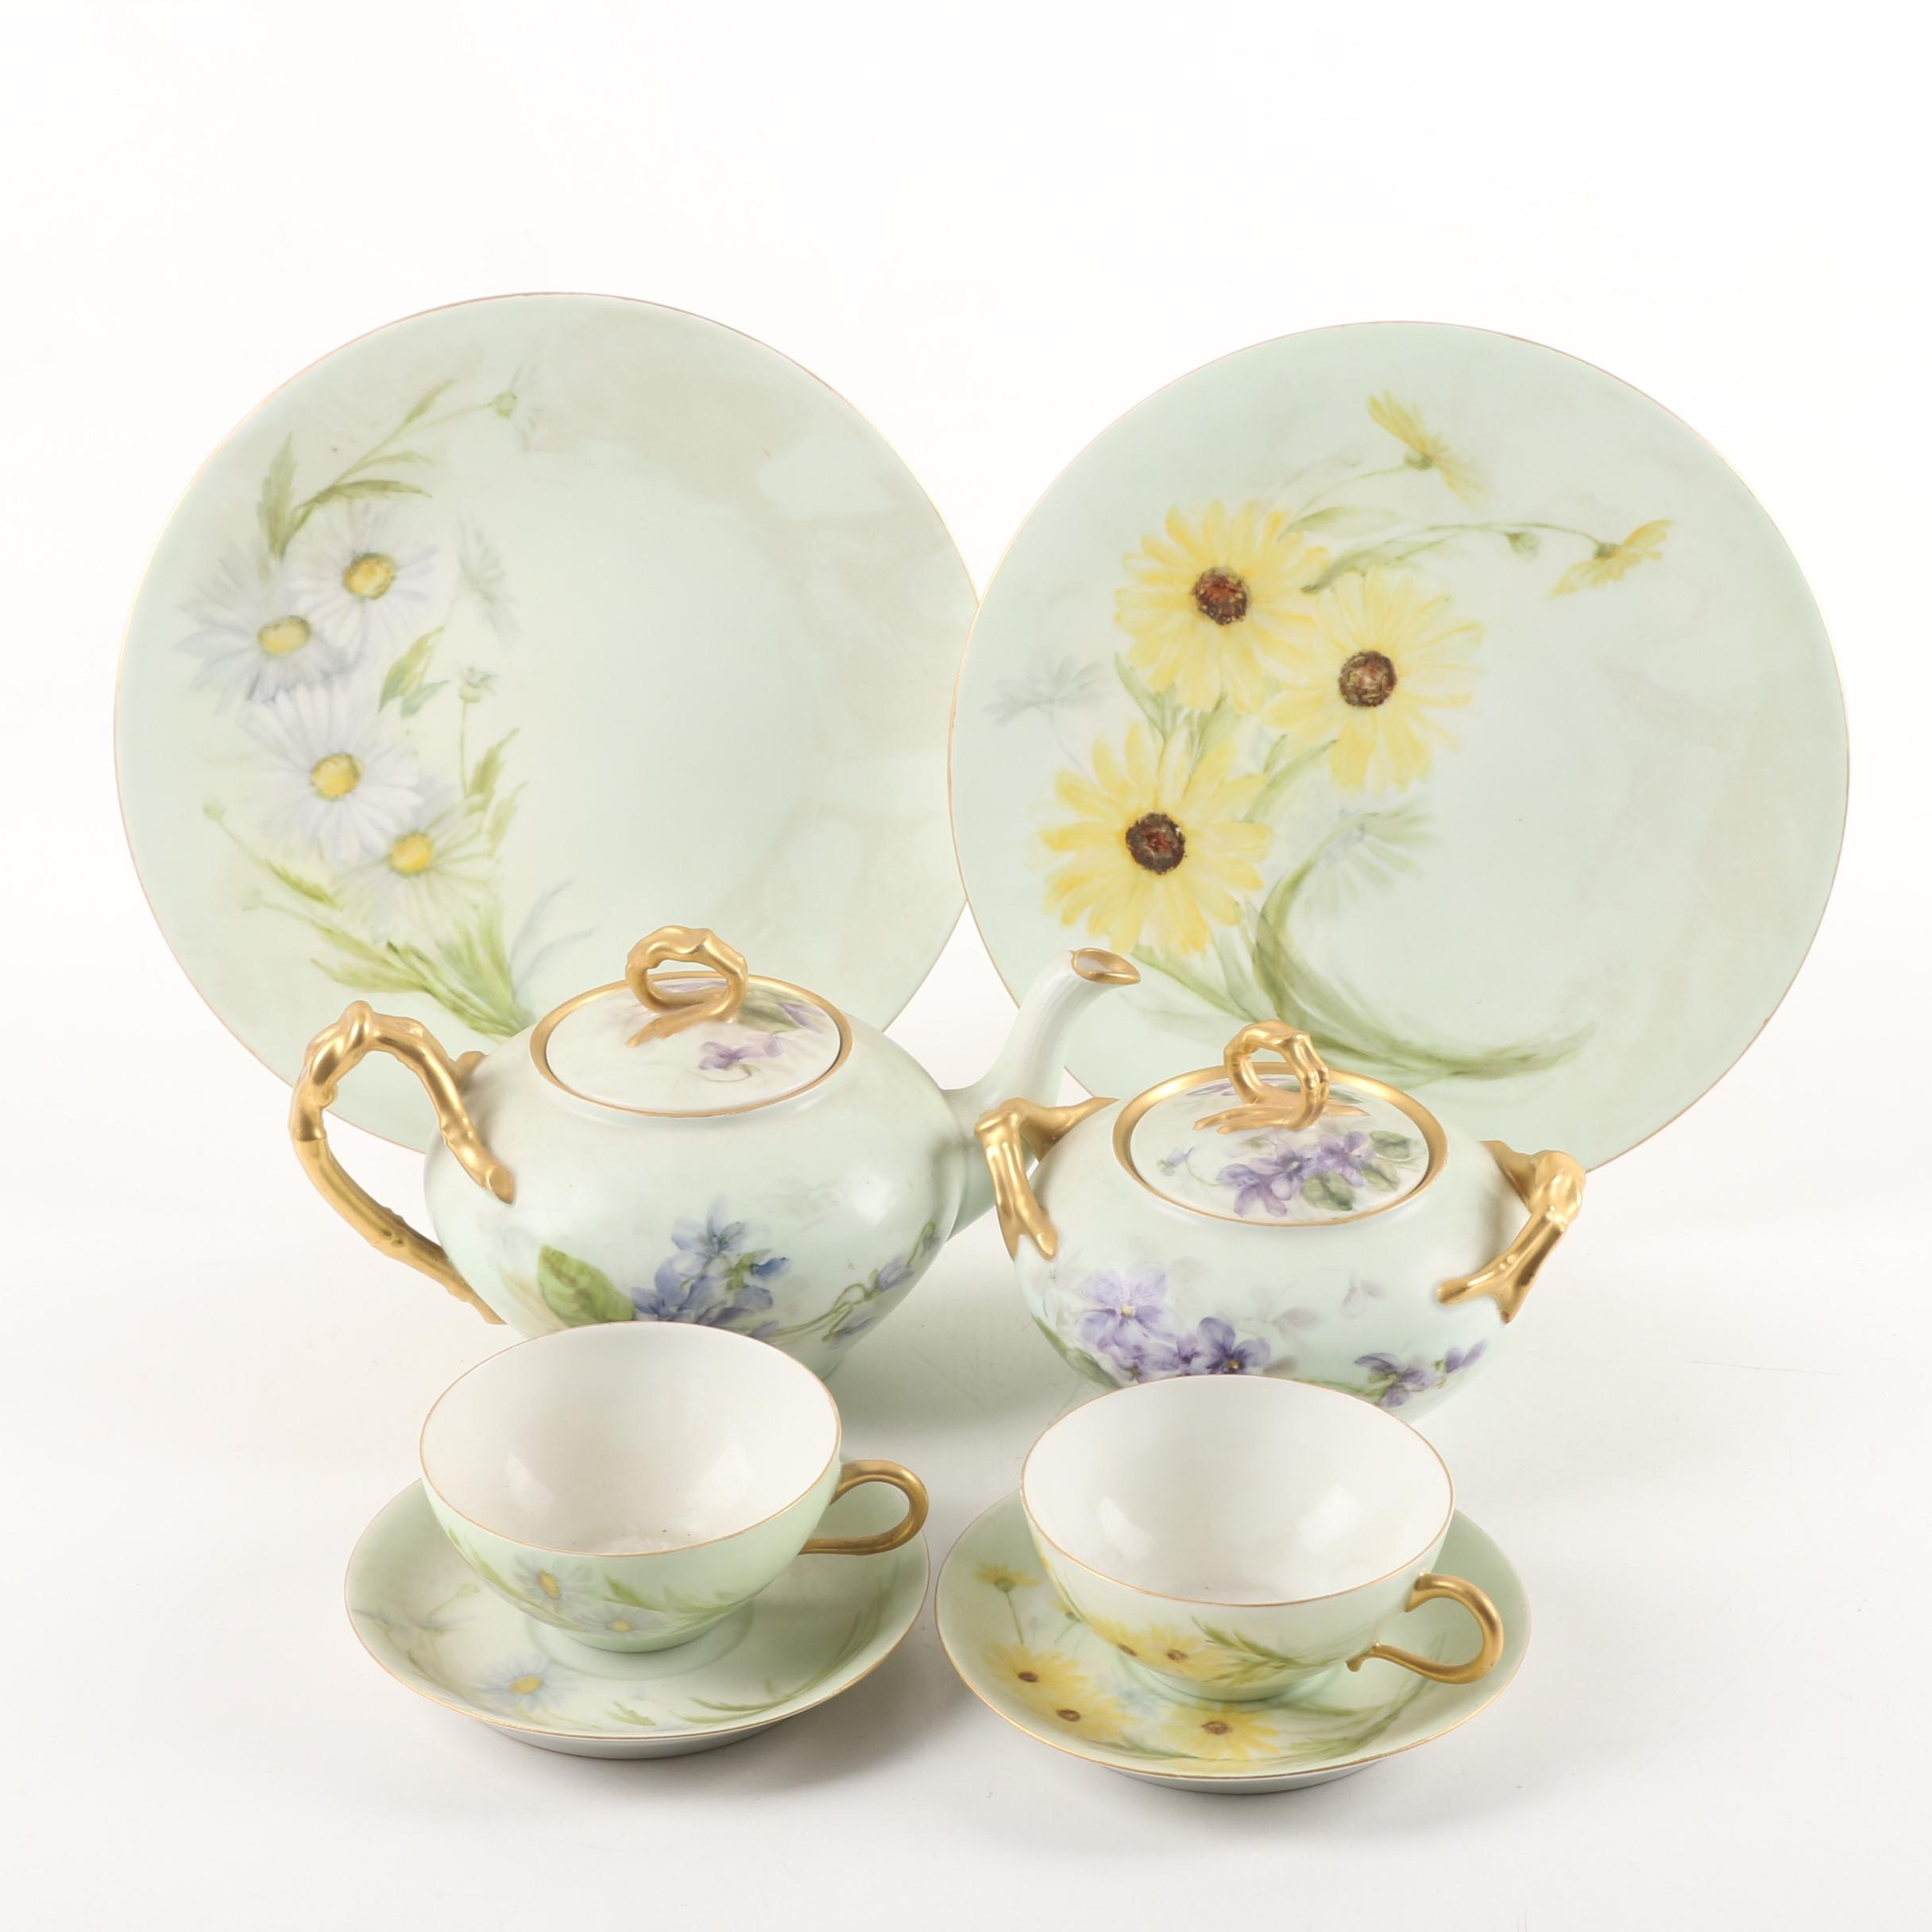 Hobbyist Painted Jean Pouyat Limoges Porcelain Tableware